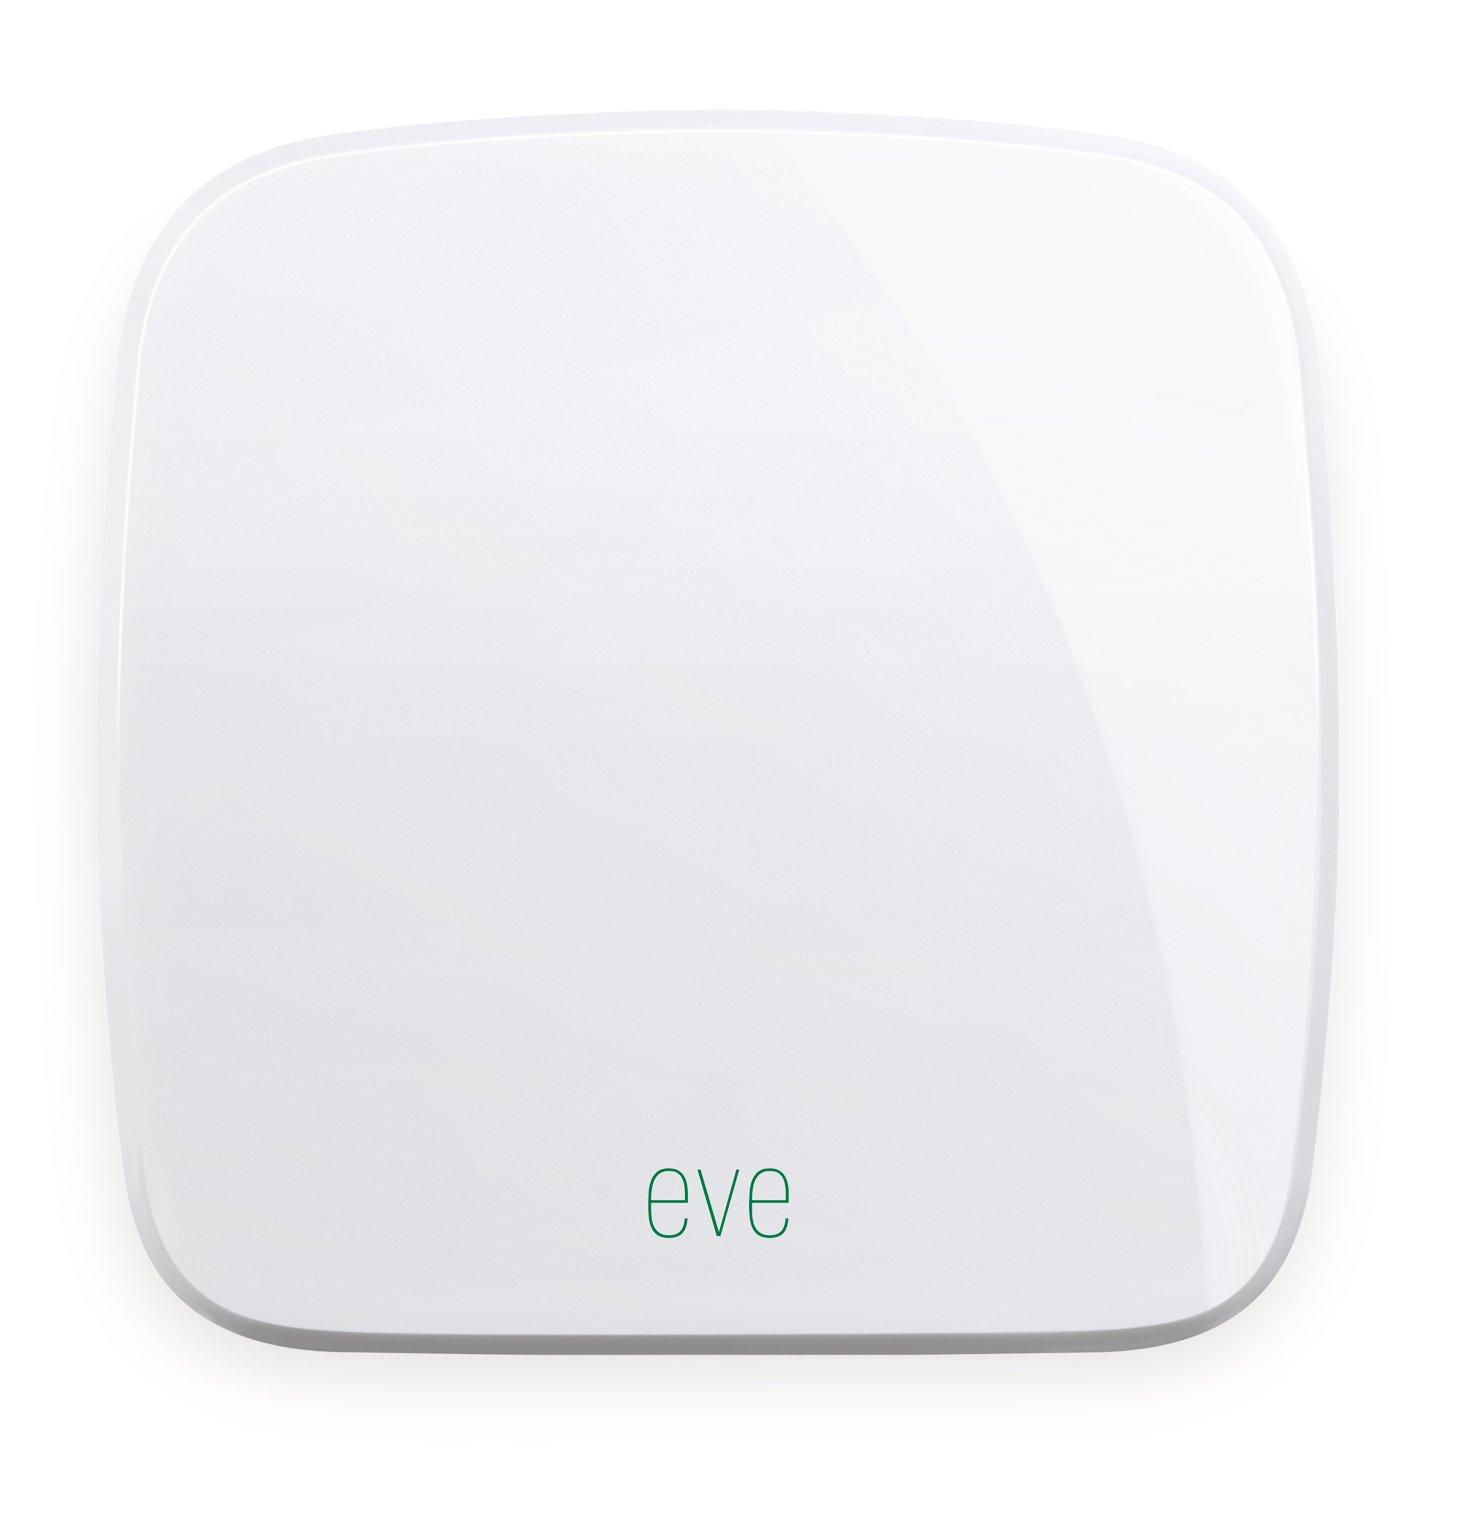 Elgato Eve Weather (1st Generation) - Wireless Outdoor Sensor with Apple HomeKit technology, Bluetooth Low Energy